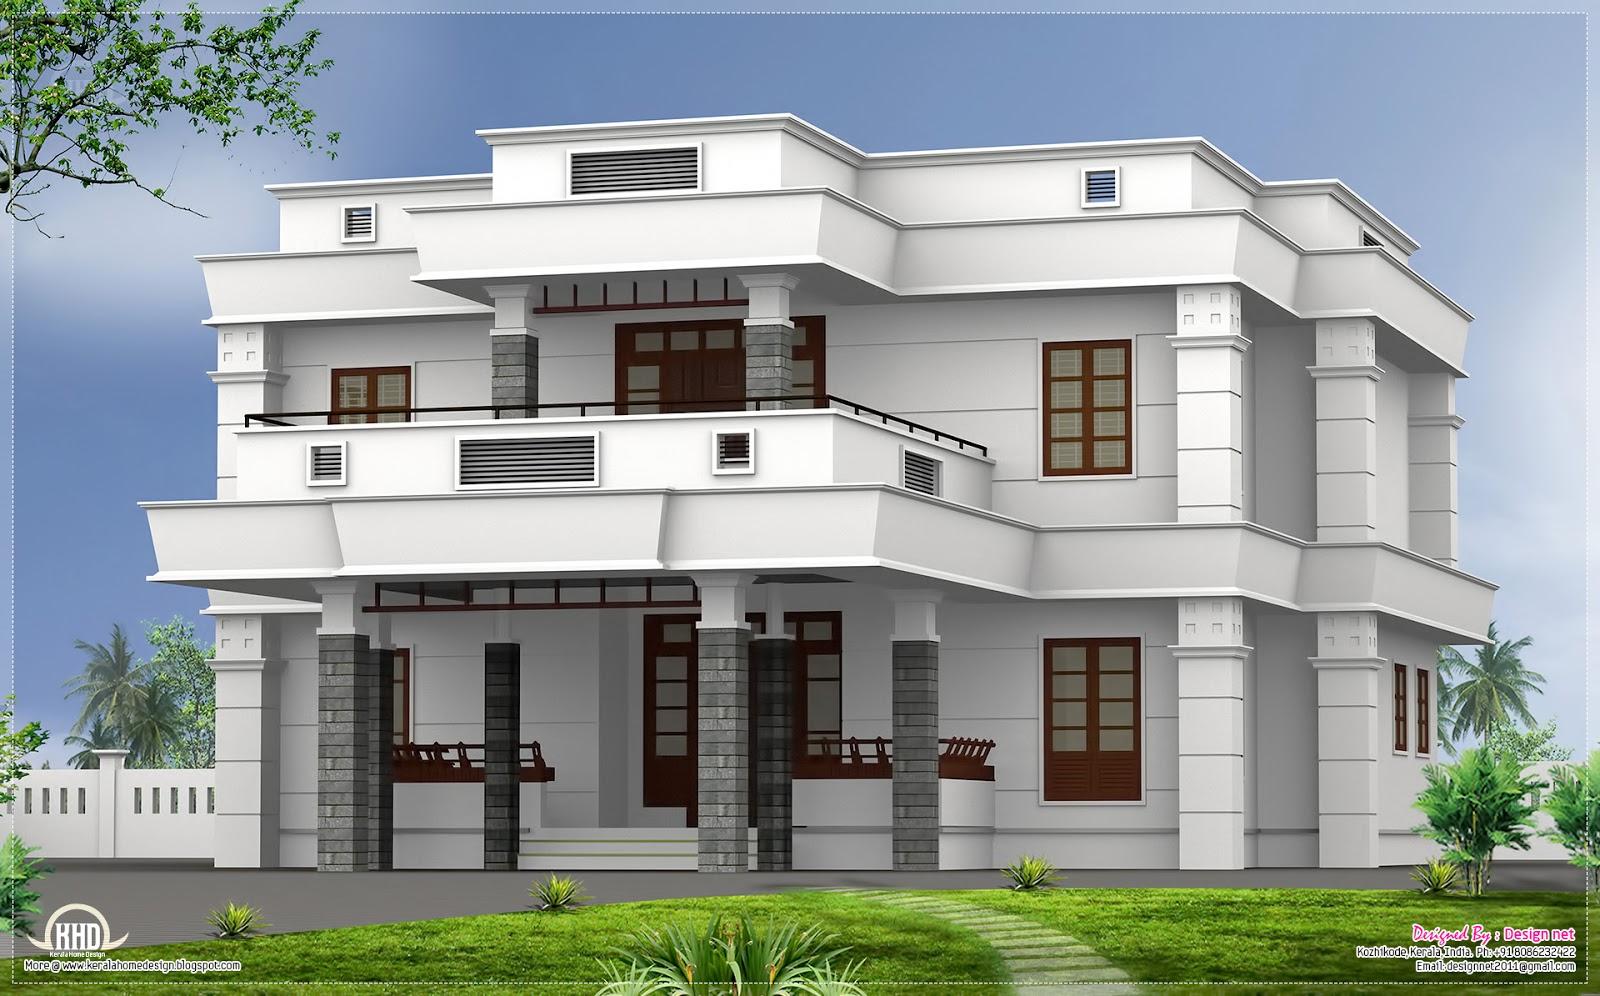 5 BHK modern flat roof house design | Home Kerala Plans